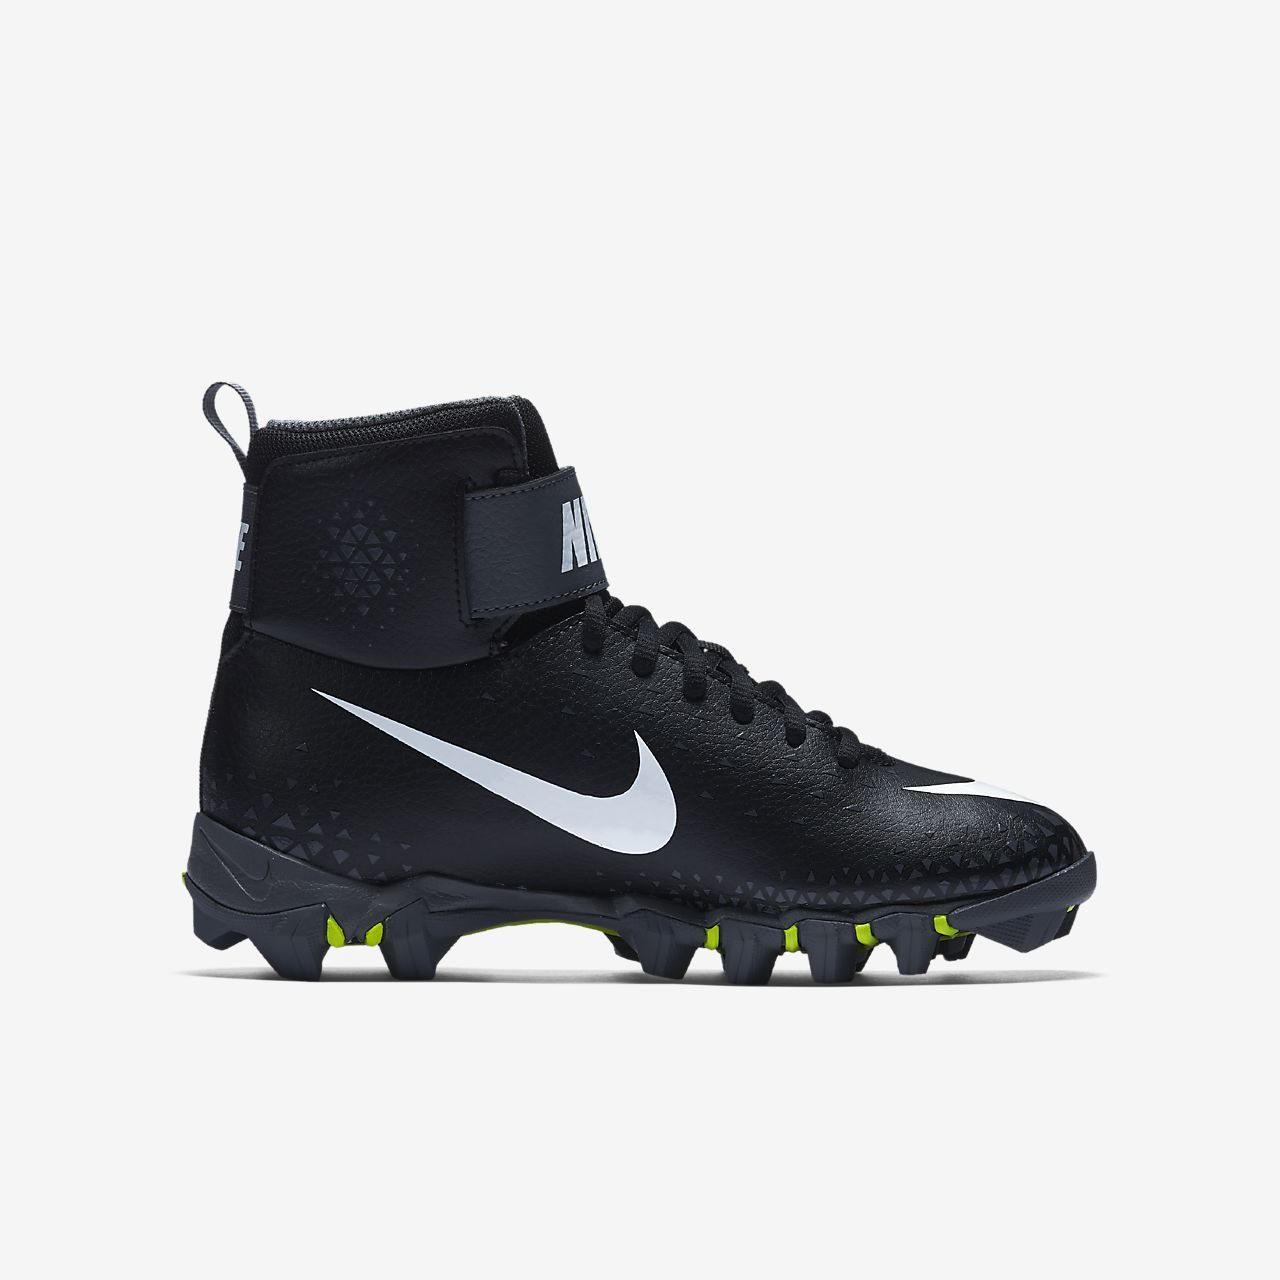 27471b0ffe2a Nike Force Savage Shark Little/Big Kids' Football Cleat. Nike.com